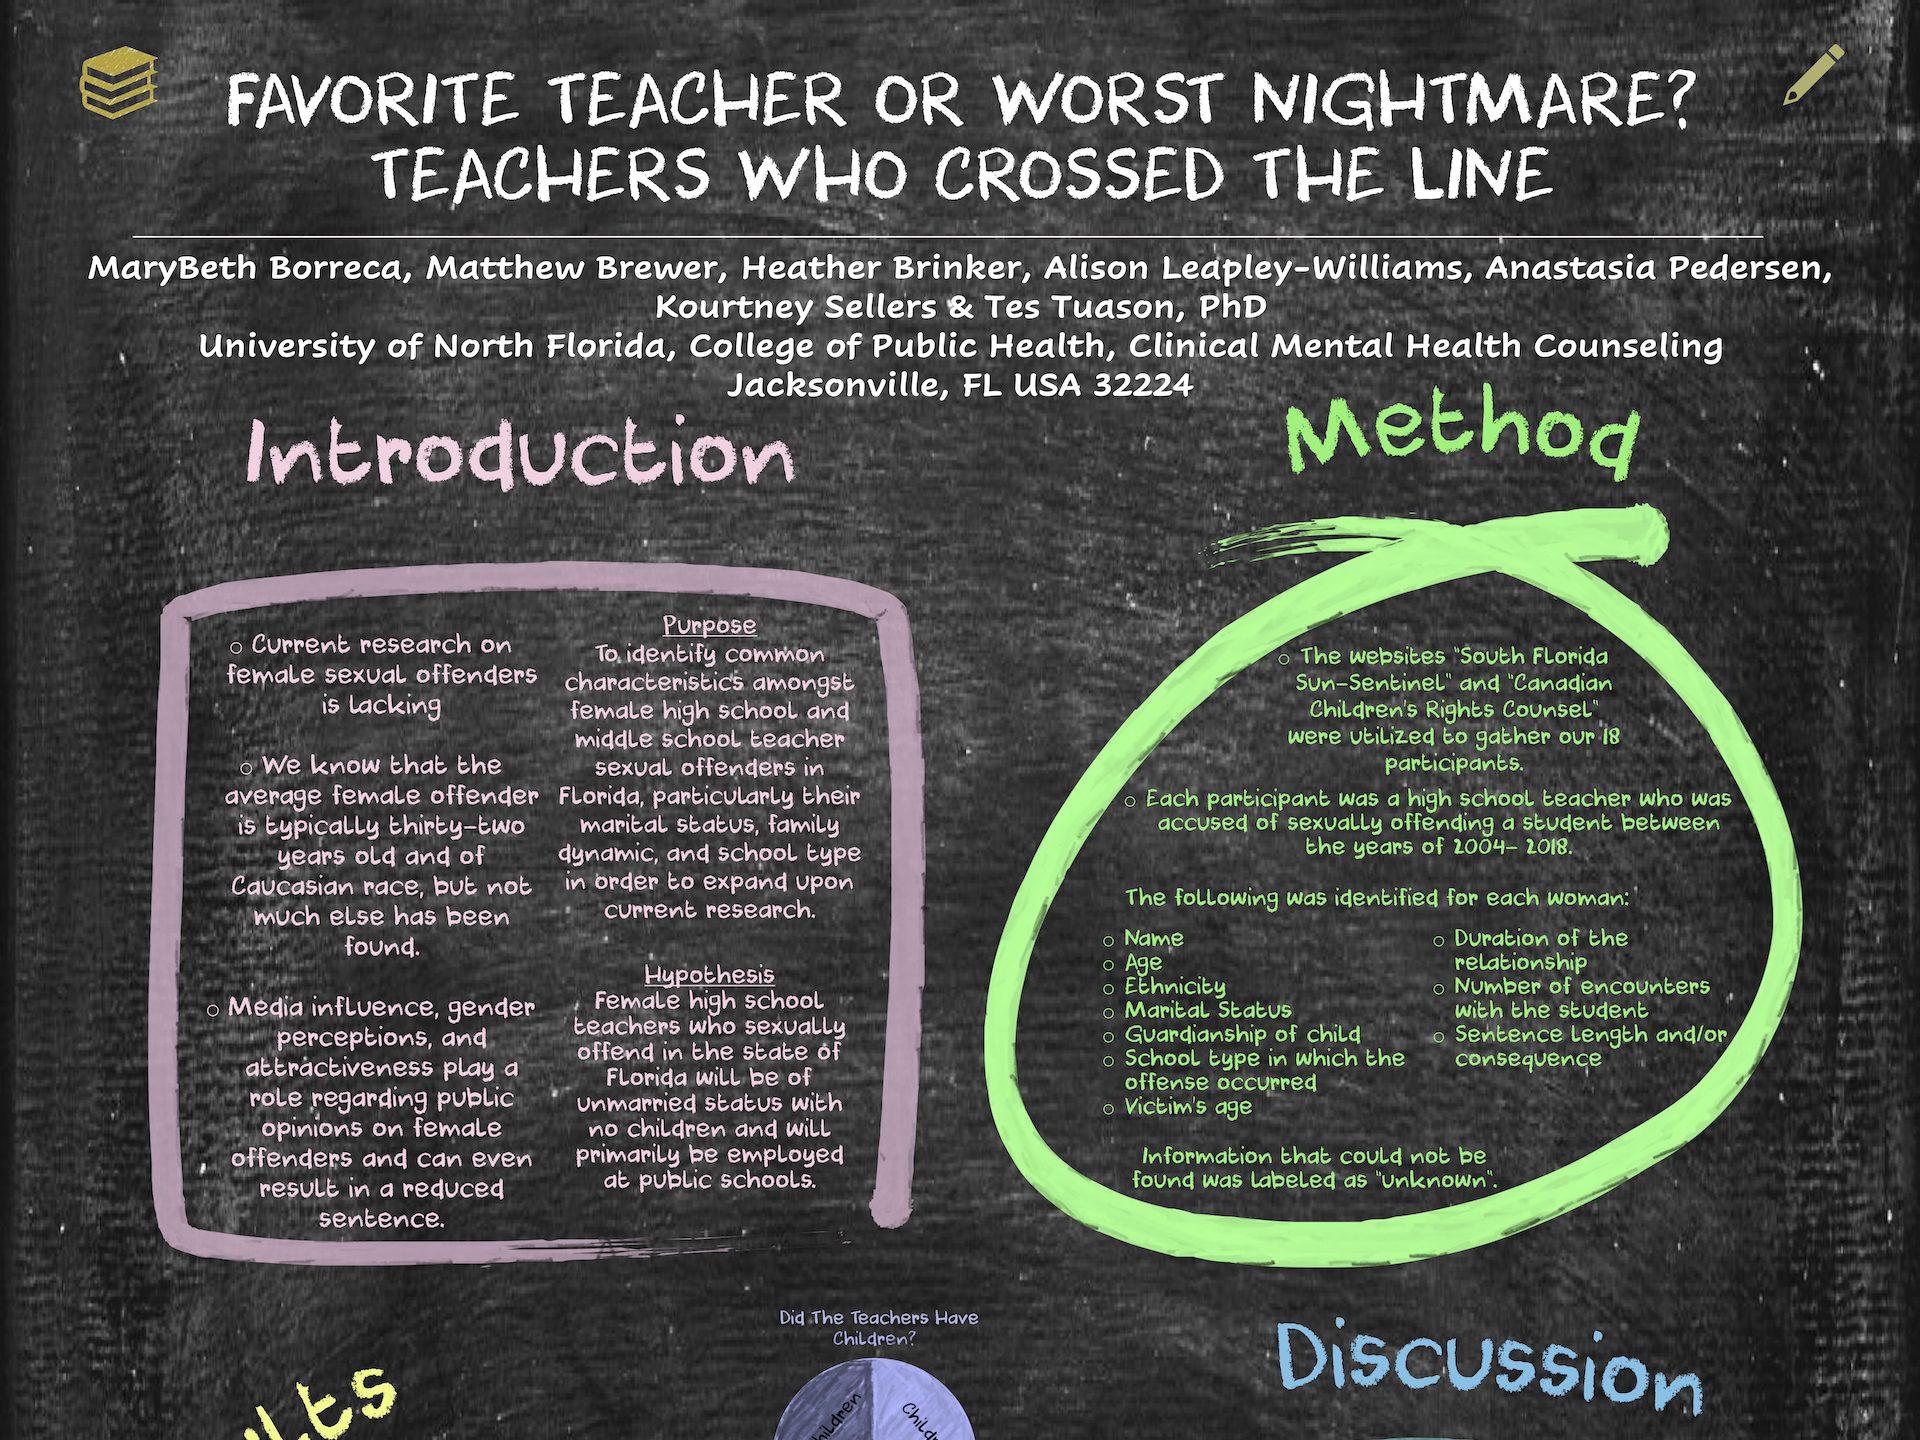 Favorite Teacher or Worst Nightmare? Teachers Who Crossed The Line poster